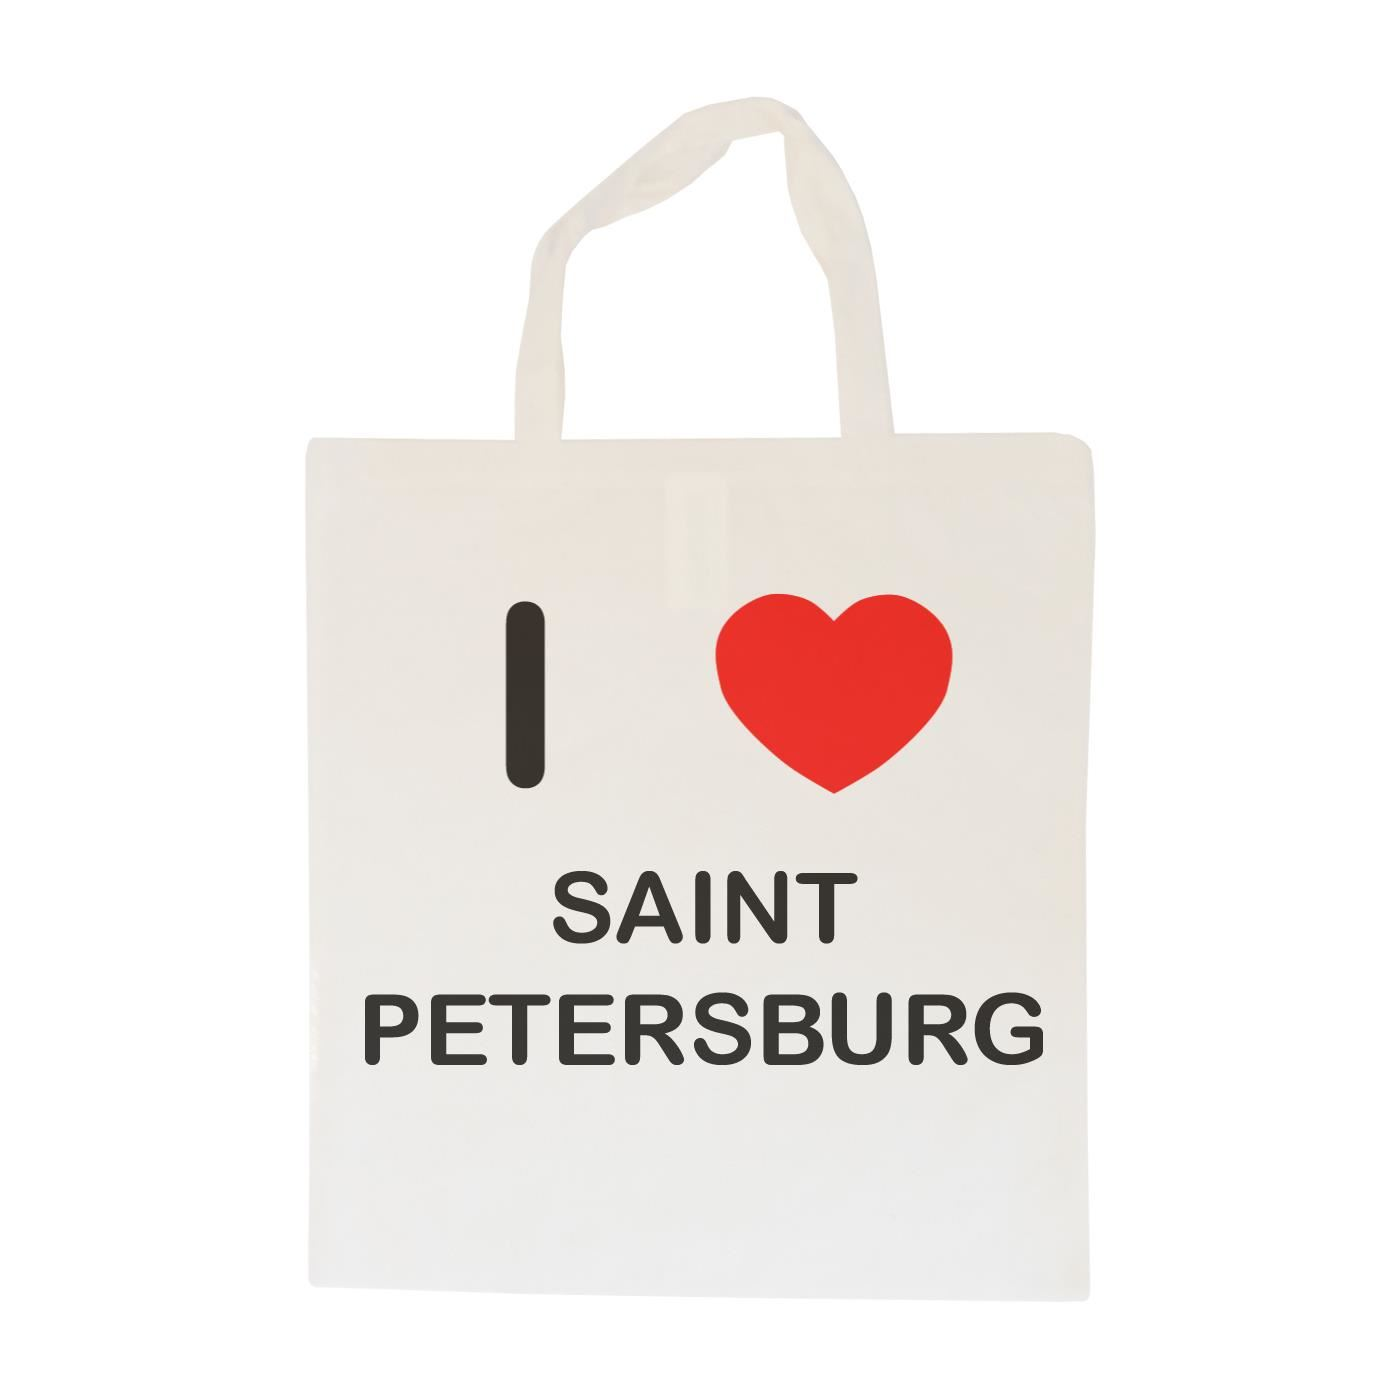 I Love Saint Petersburg - Cotton Bag | Size choice Tote, Shopper or Sling